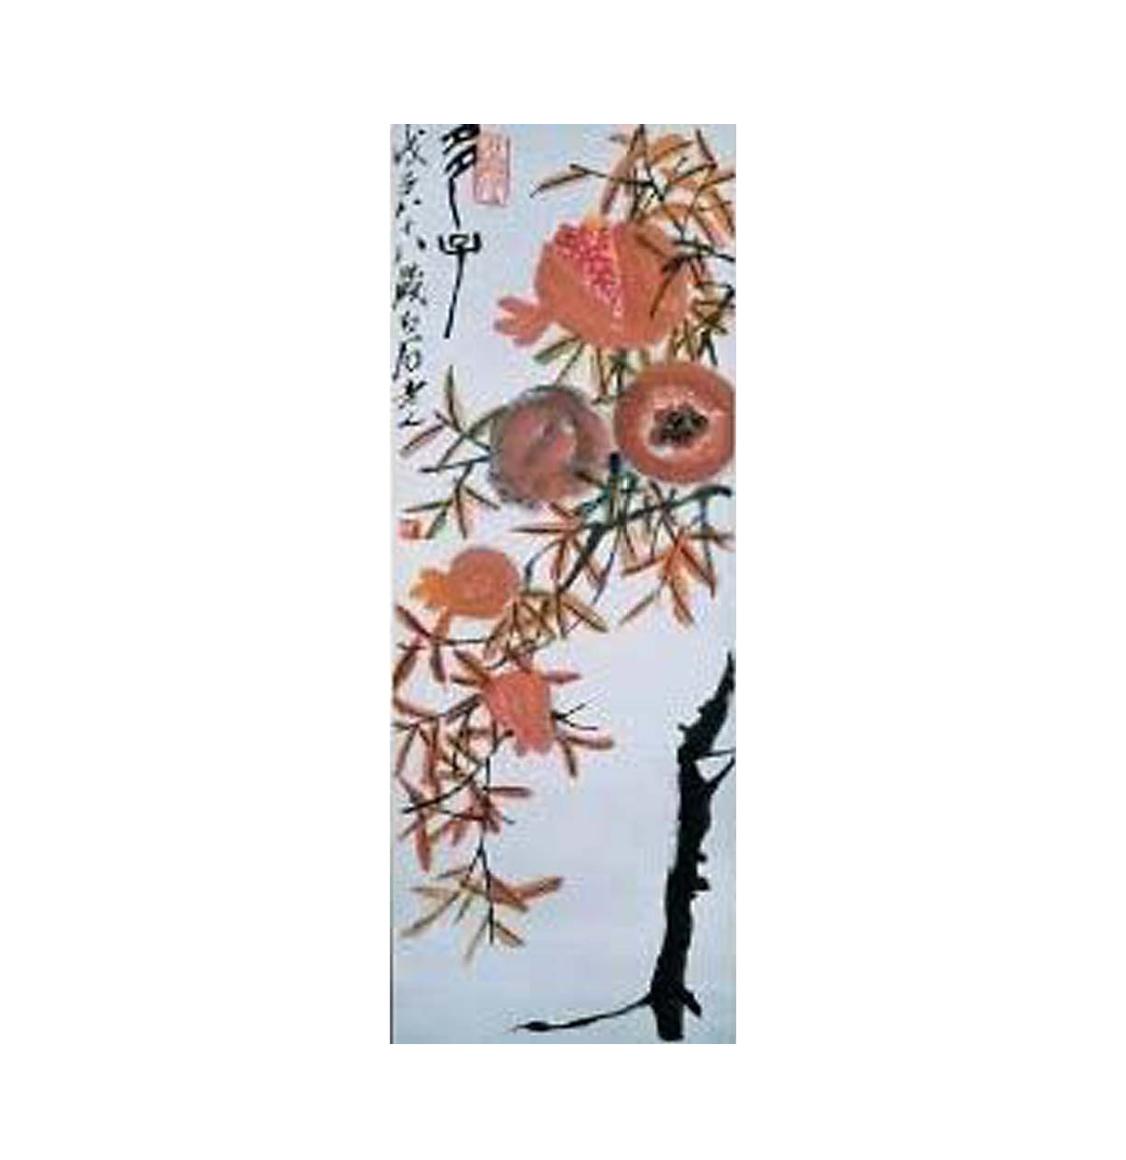 Ricordi Παζλ Chinese Art Melograni 1000 Κομμάτια RICO5802N31001